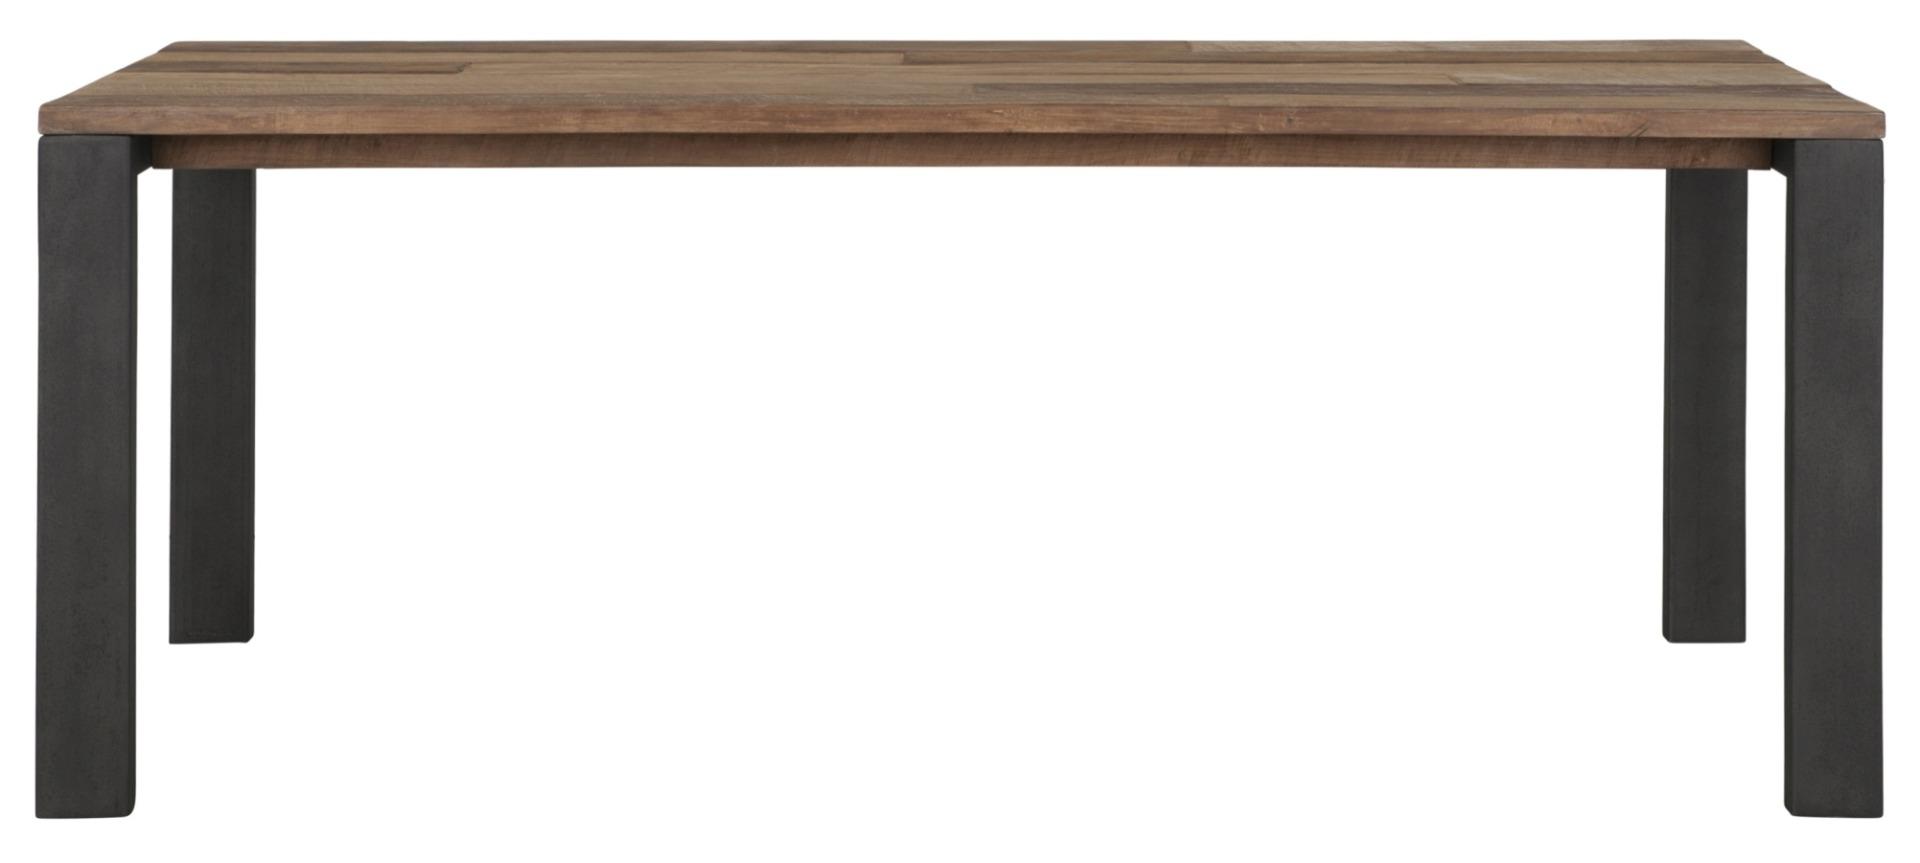 24Designs Timeless Eettafel Tracks - L150 X B90 X H78 Cm - Teakhout Gerecycled